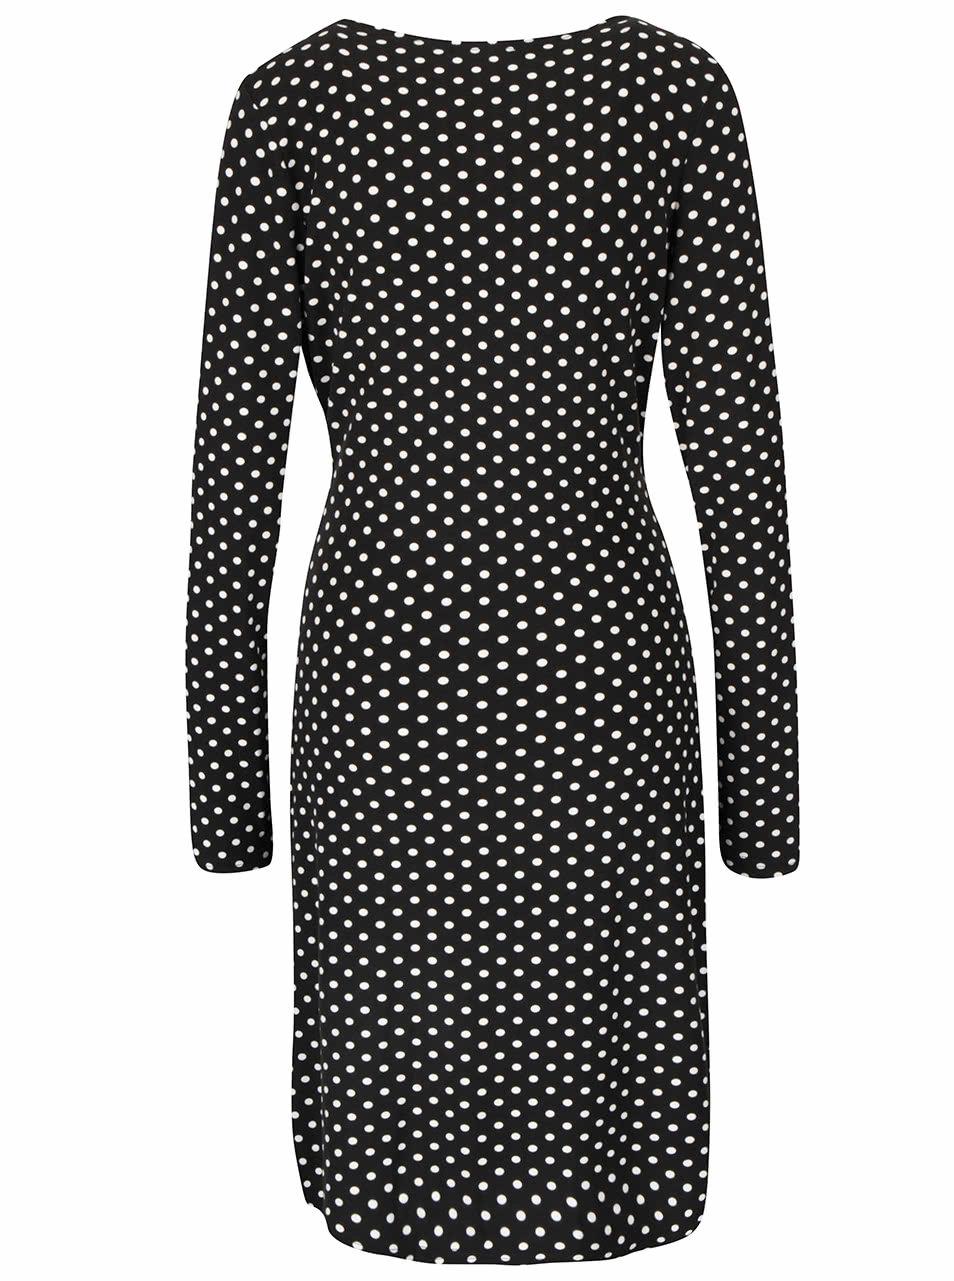 5b6f82c7de17 Čierne bodkované šaty s prekladaným dekoltom Smashed Lemon ...